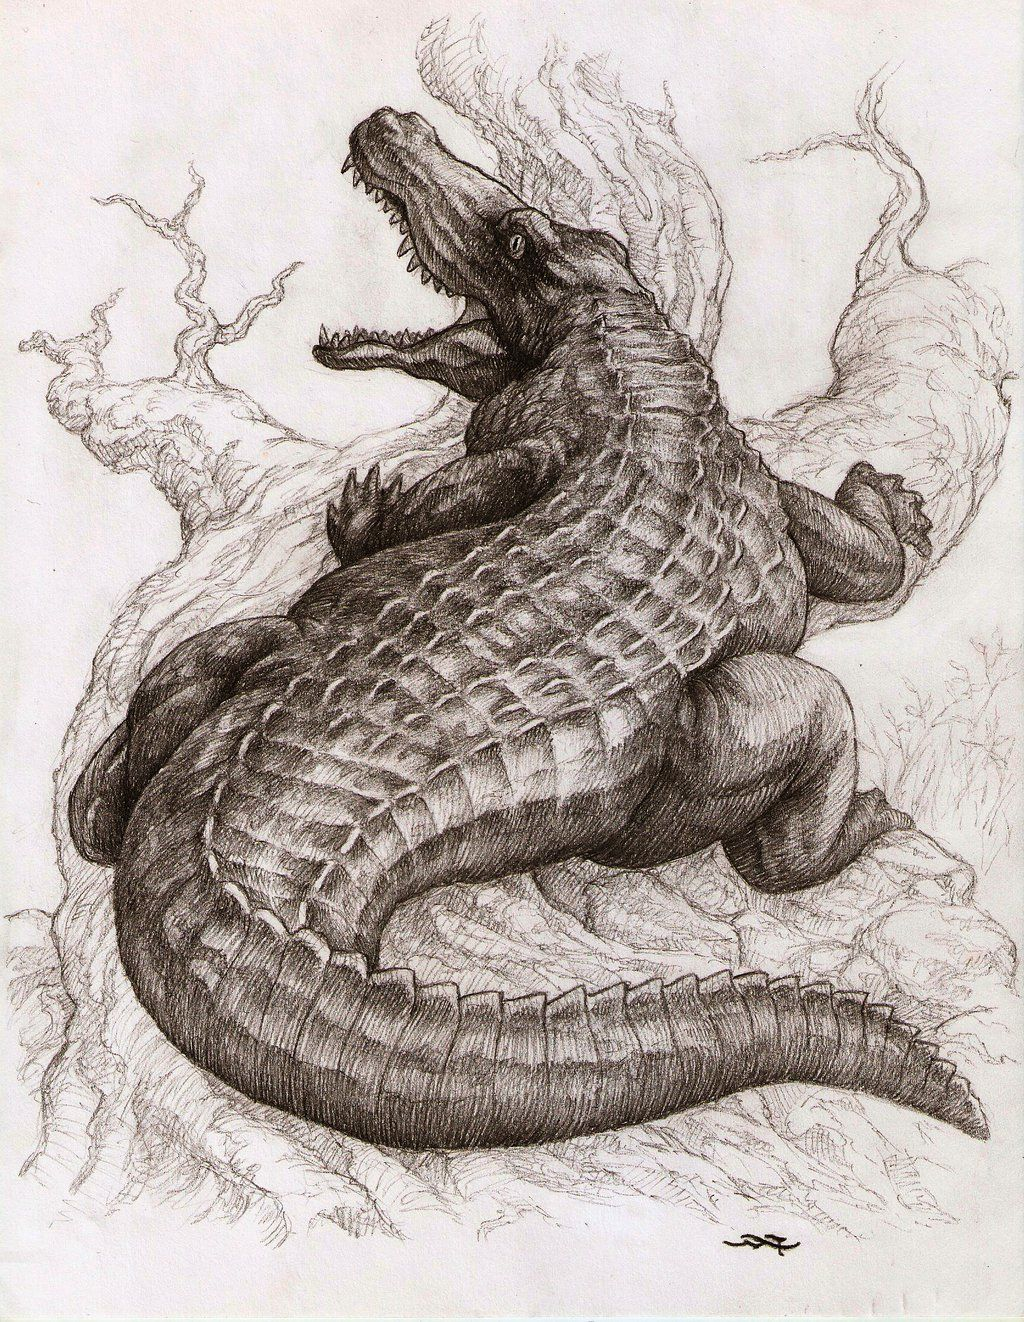 Pin de Tonya Clayton en Crocodiles & Gators | Pinterest | Modo ...